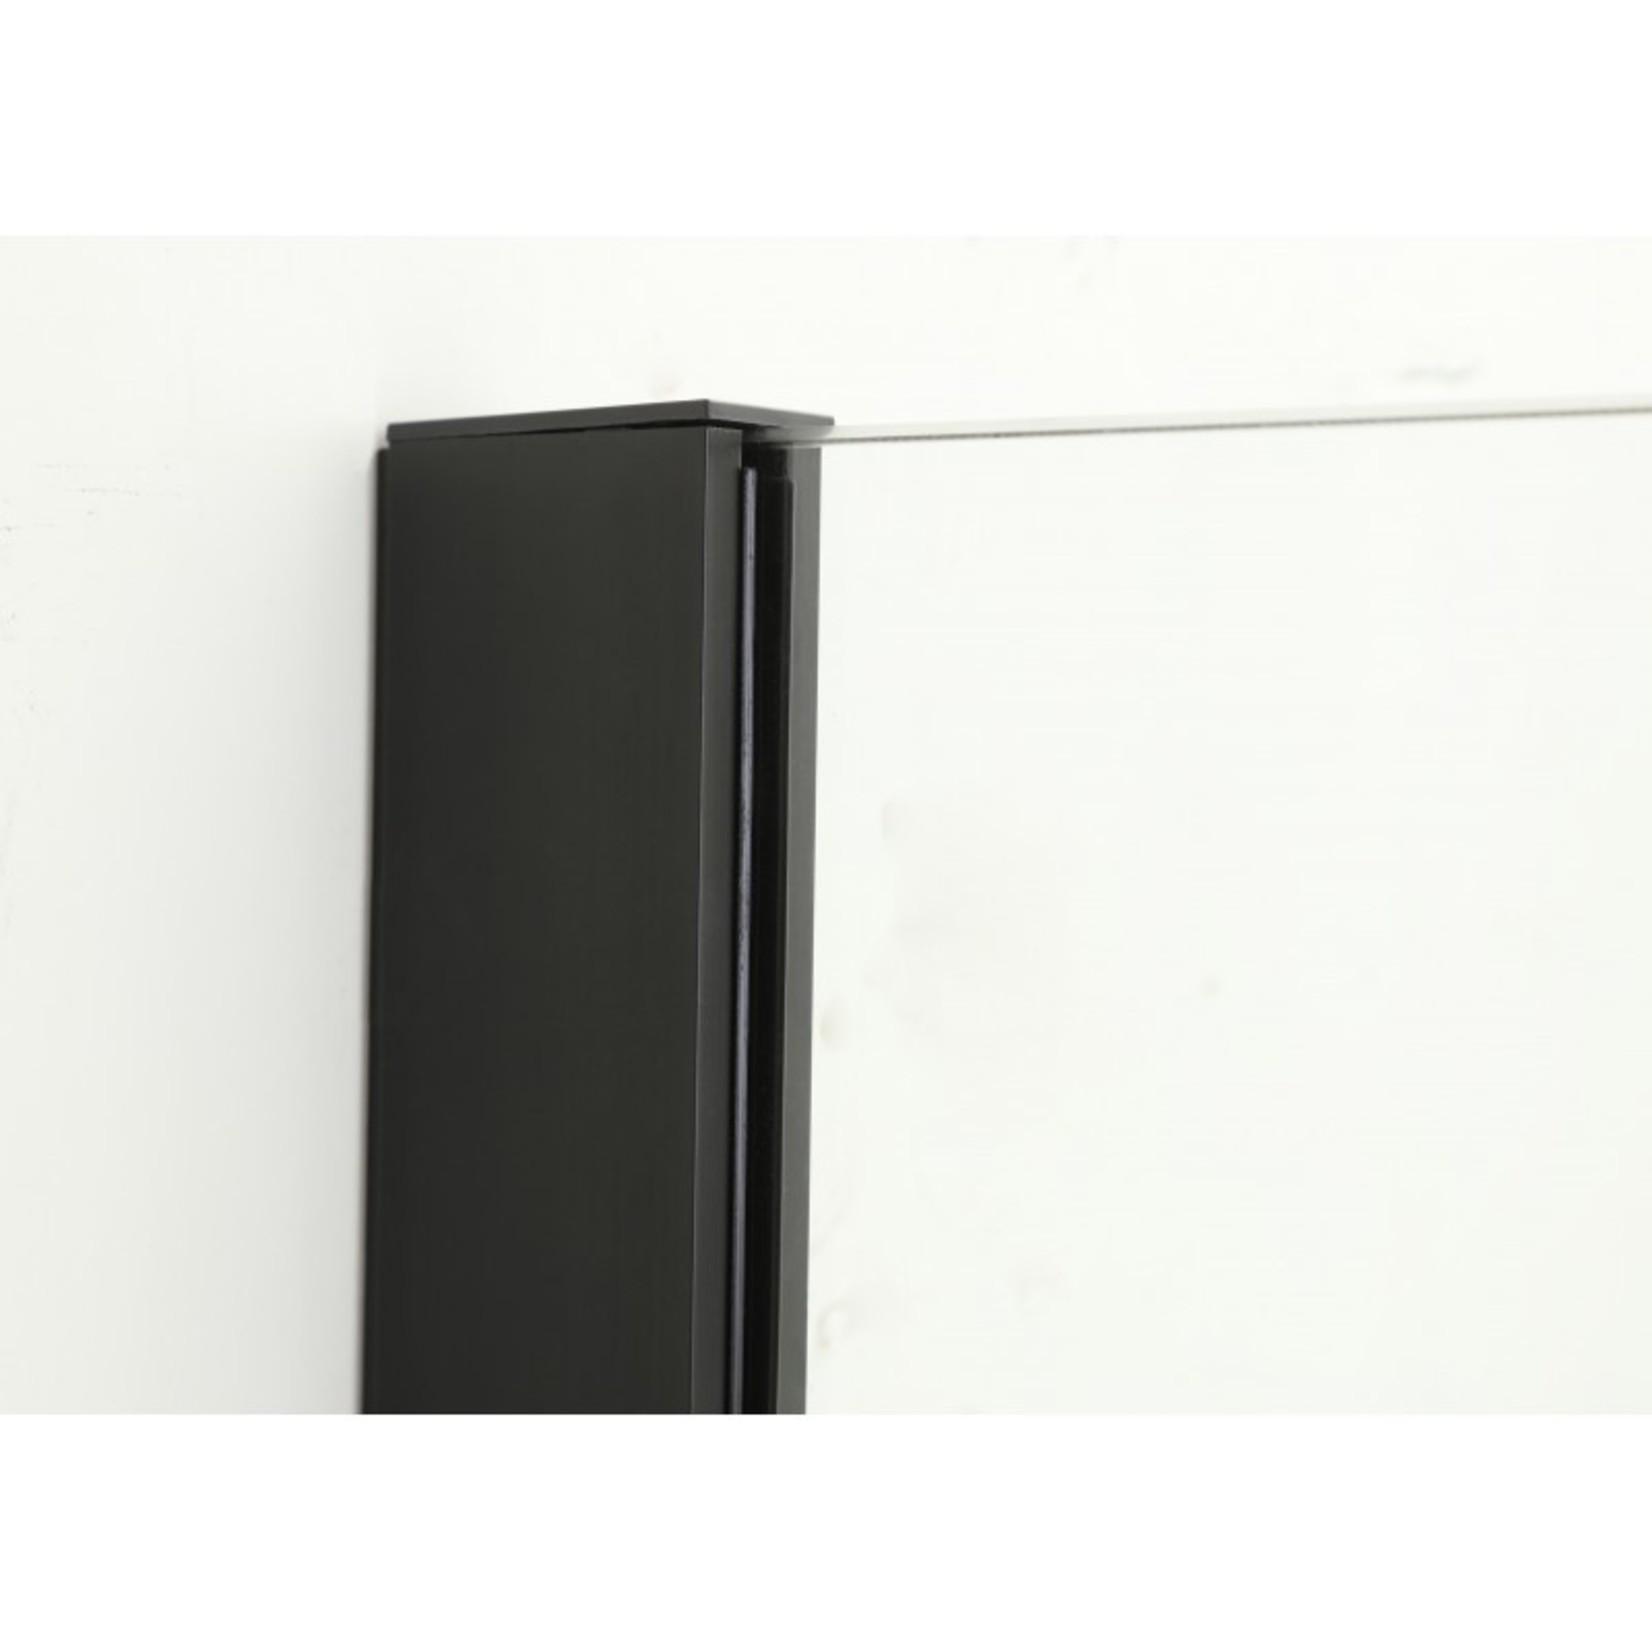 48 '' Matte Black Italian style glass shower